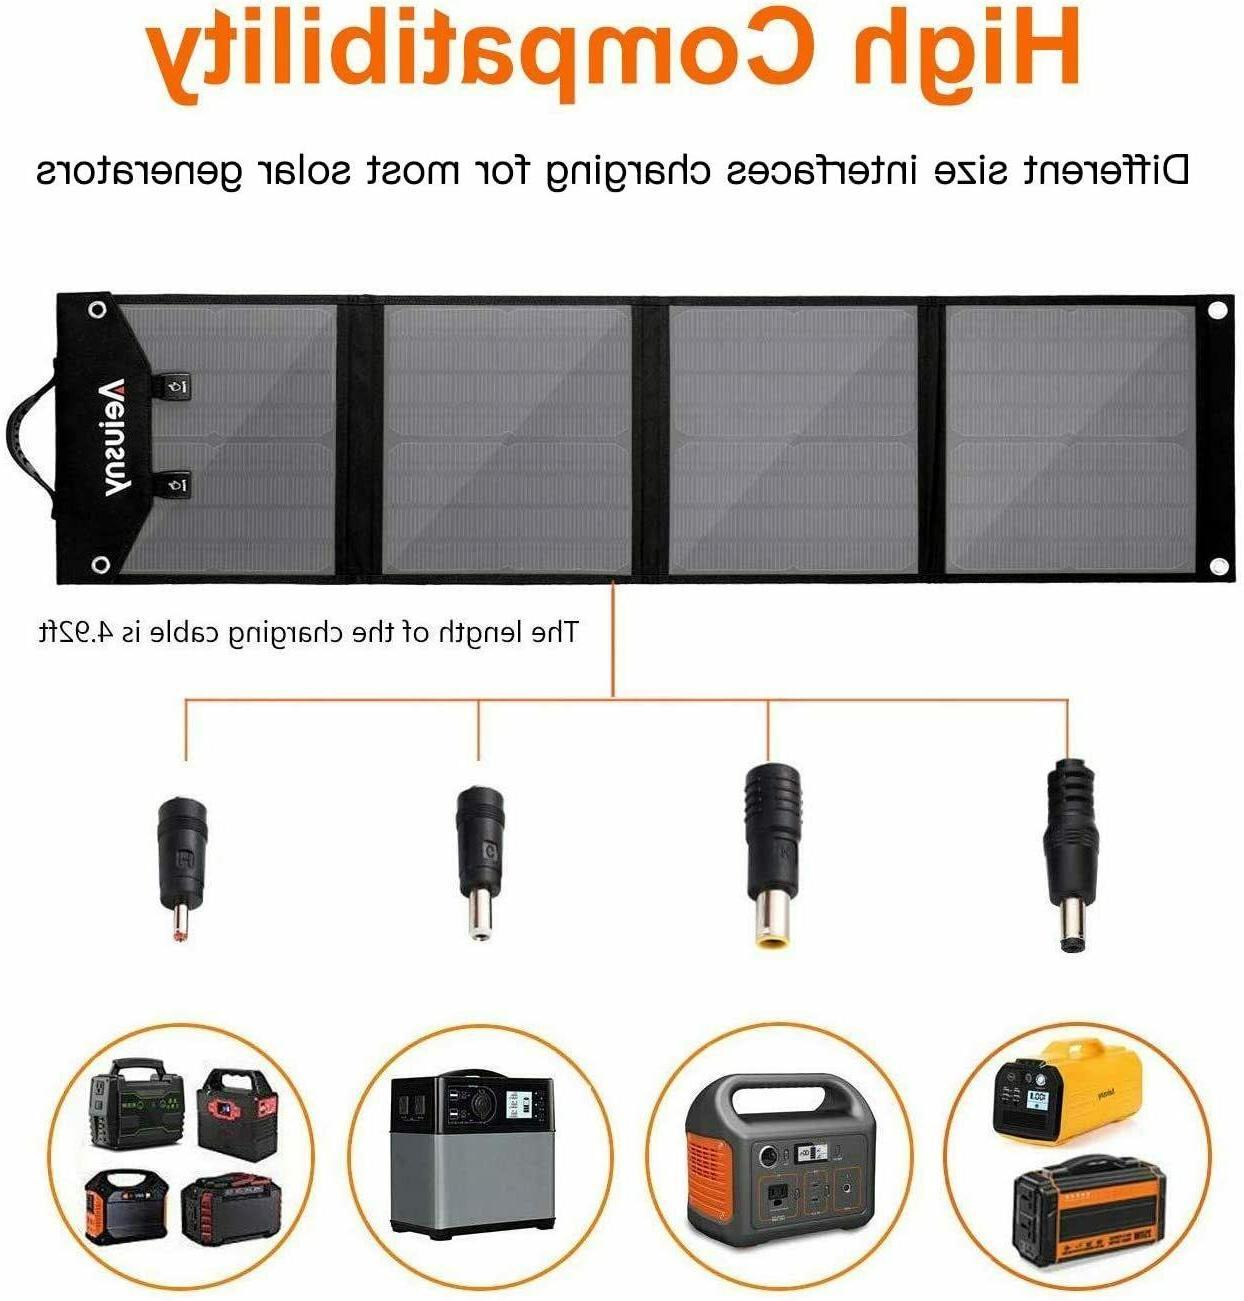 4 Foldable Portable Charger Suaoki/Jackery/Webetop Portable